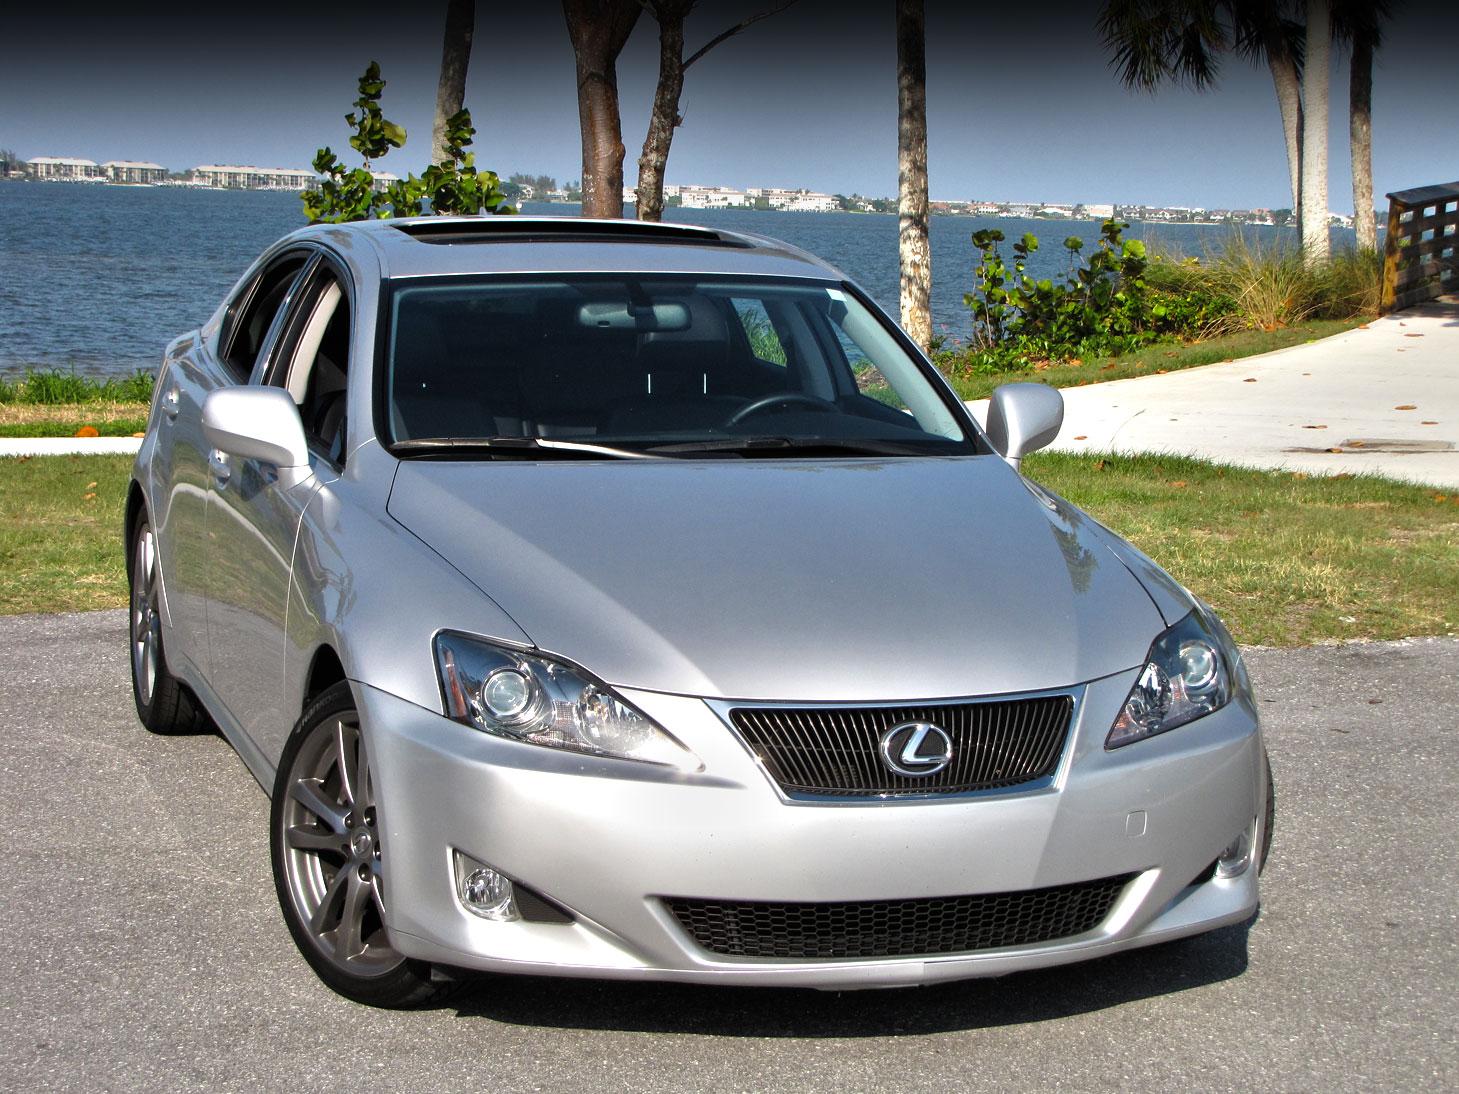 Lexus Extended Warranty >> Stock 2008 Lexus IS250 1/4 mile Drag Racing timeslip specs 0-60 - DragTimes.com